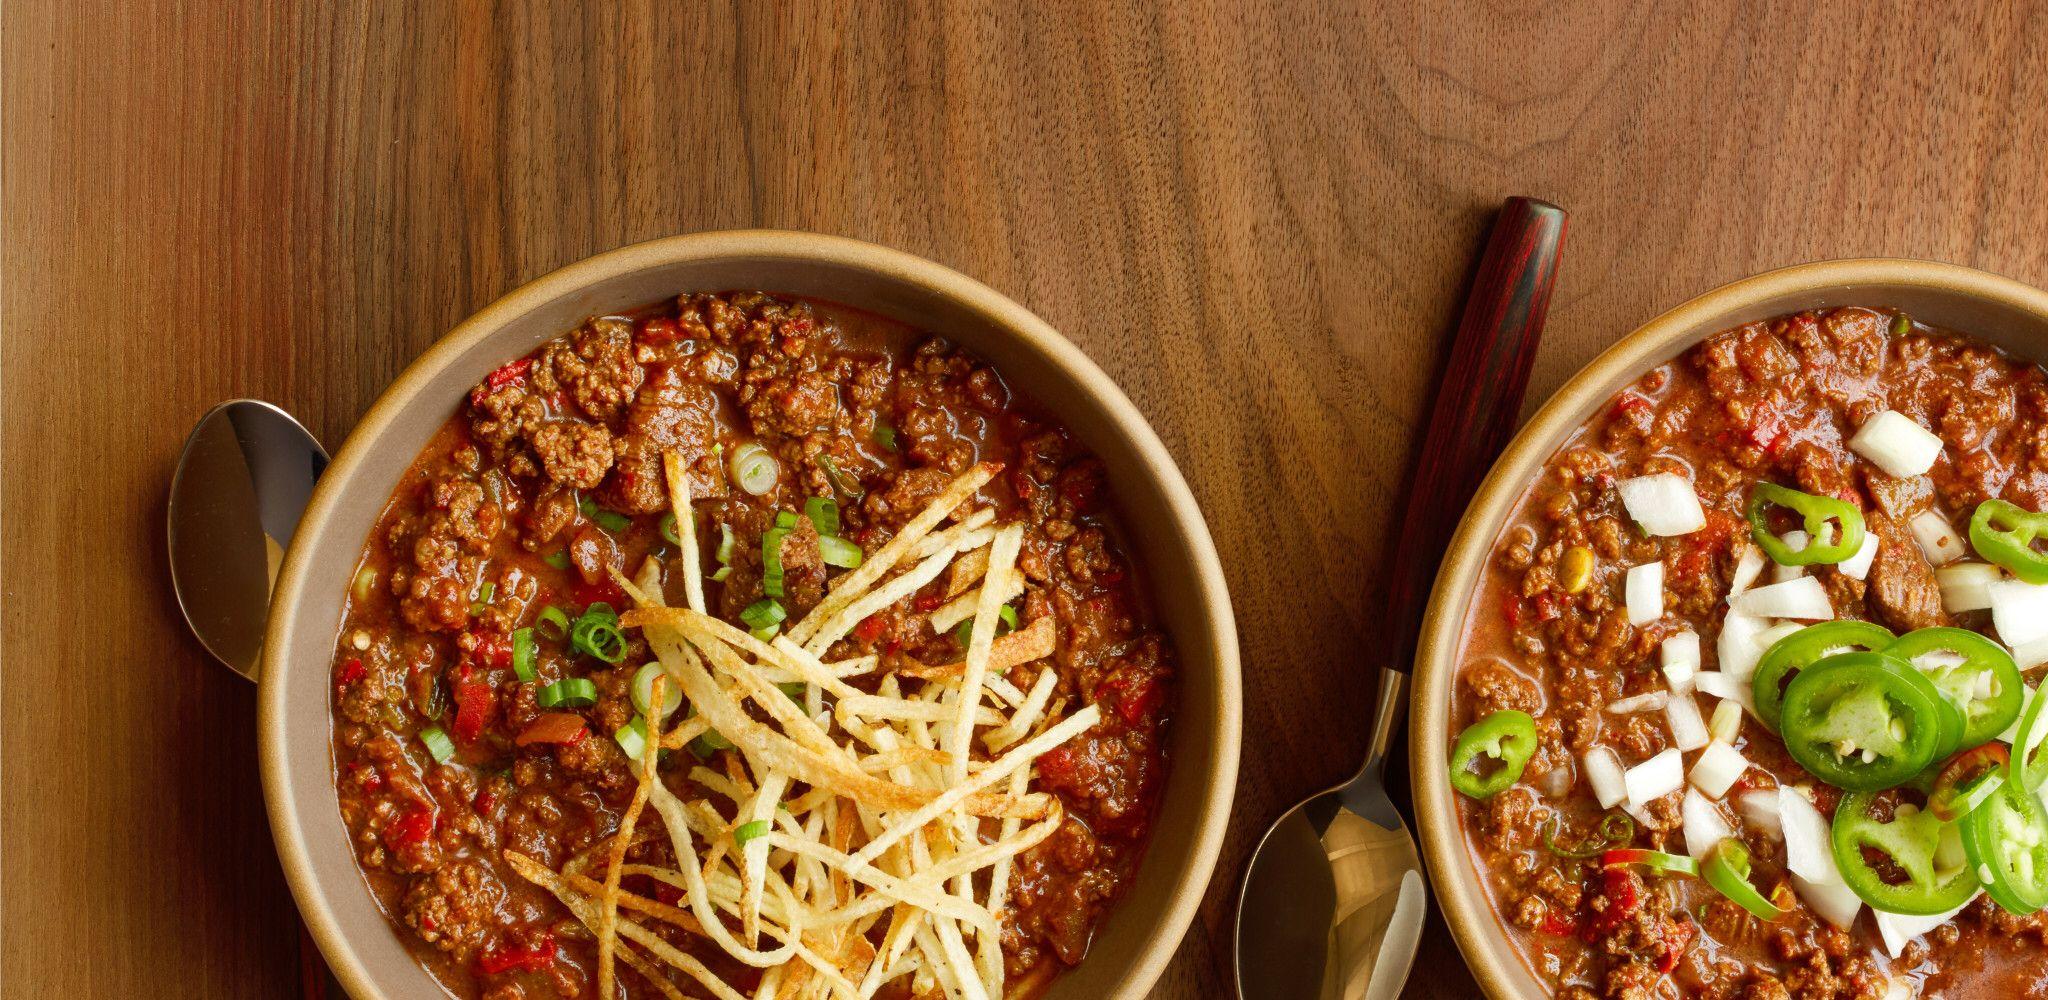 Best Chili Recipe Food Network